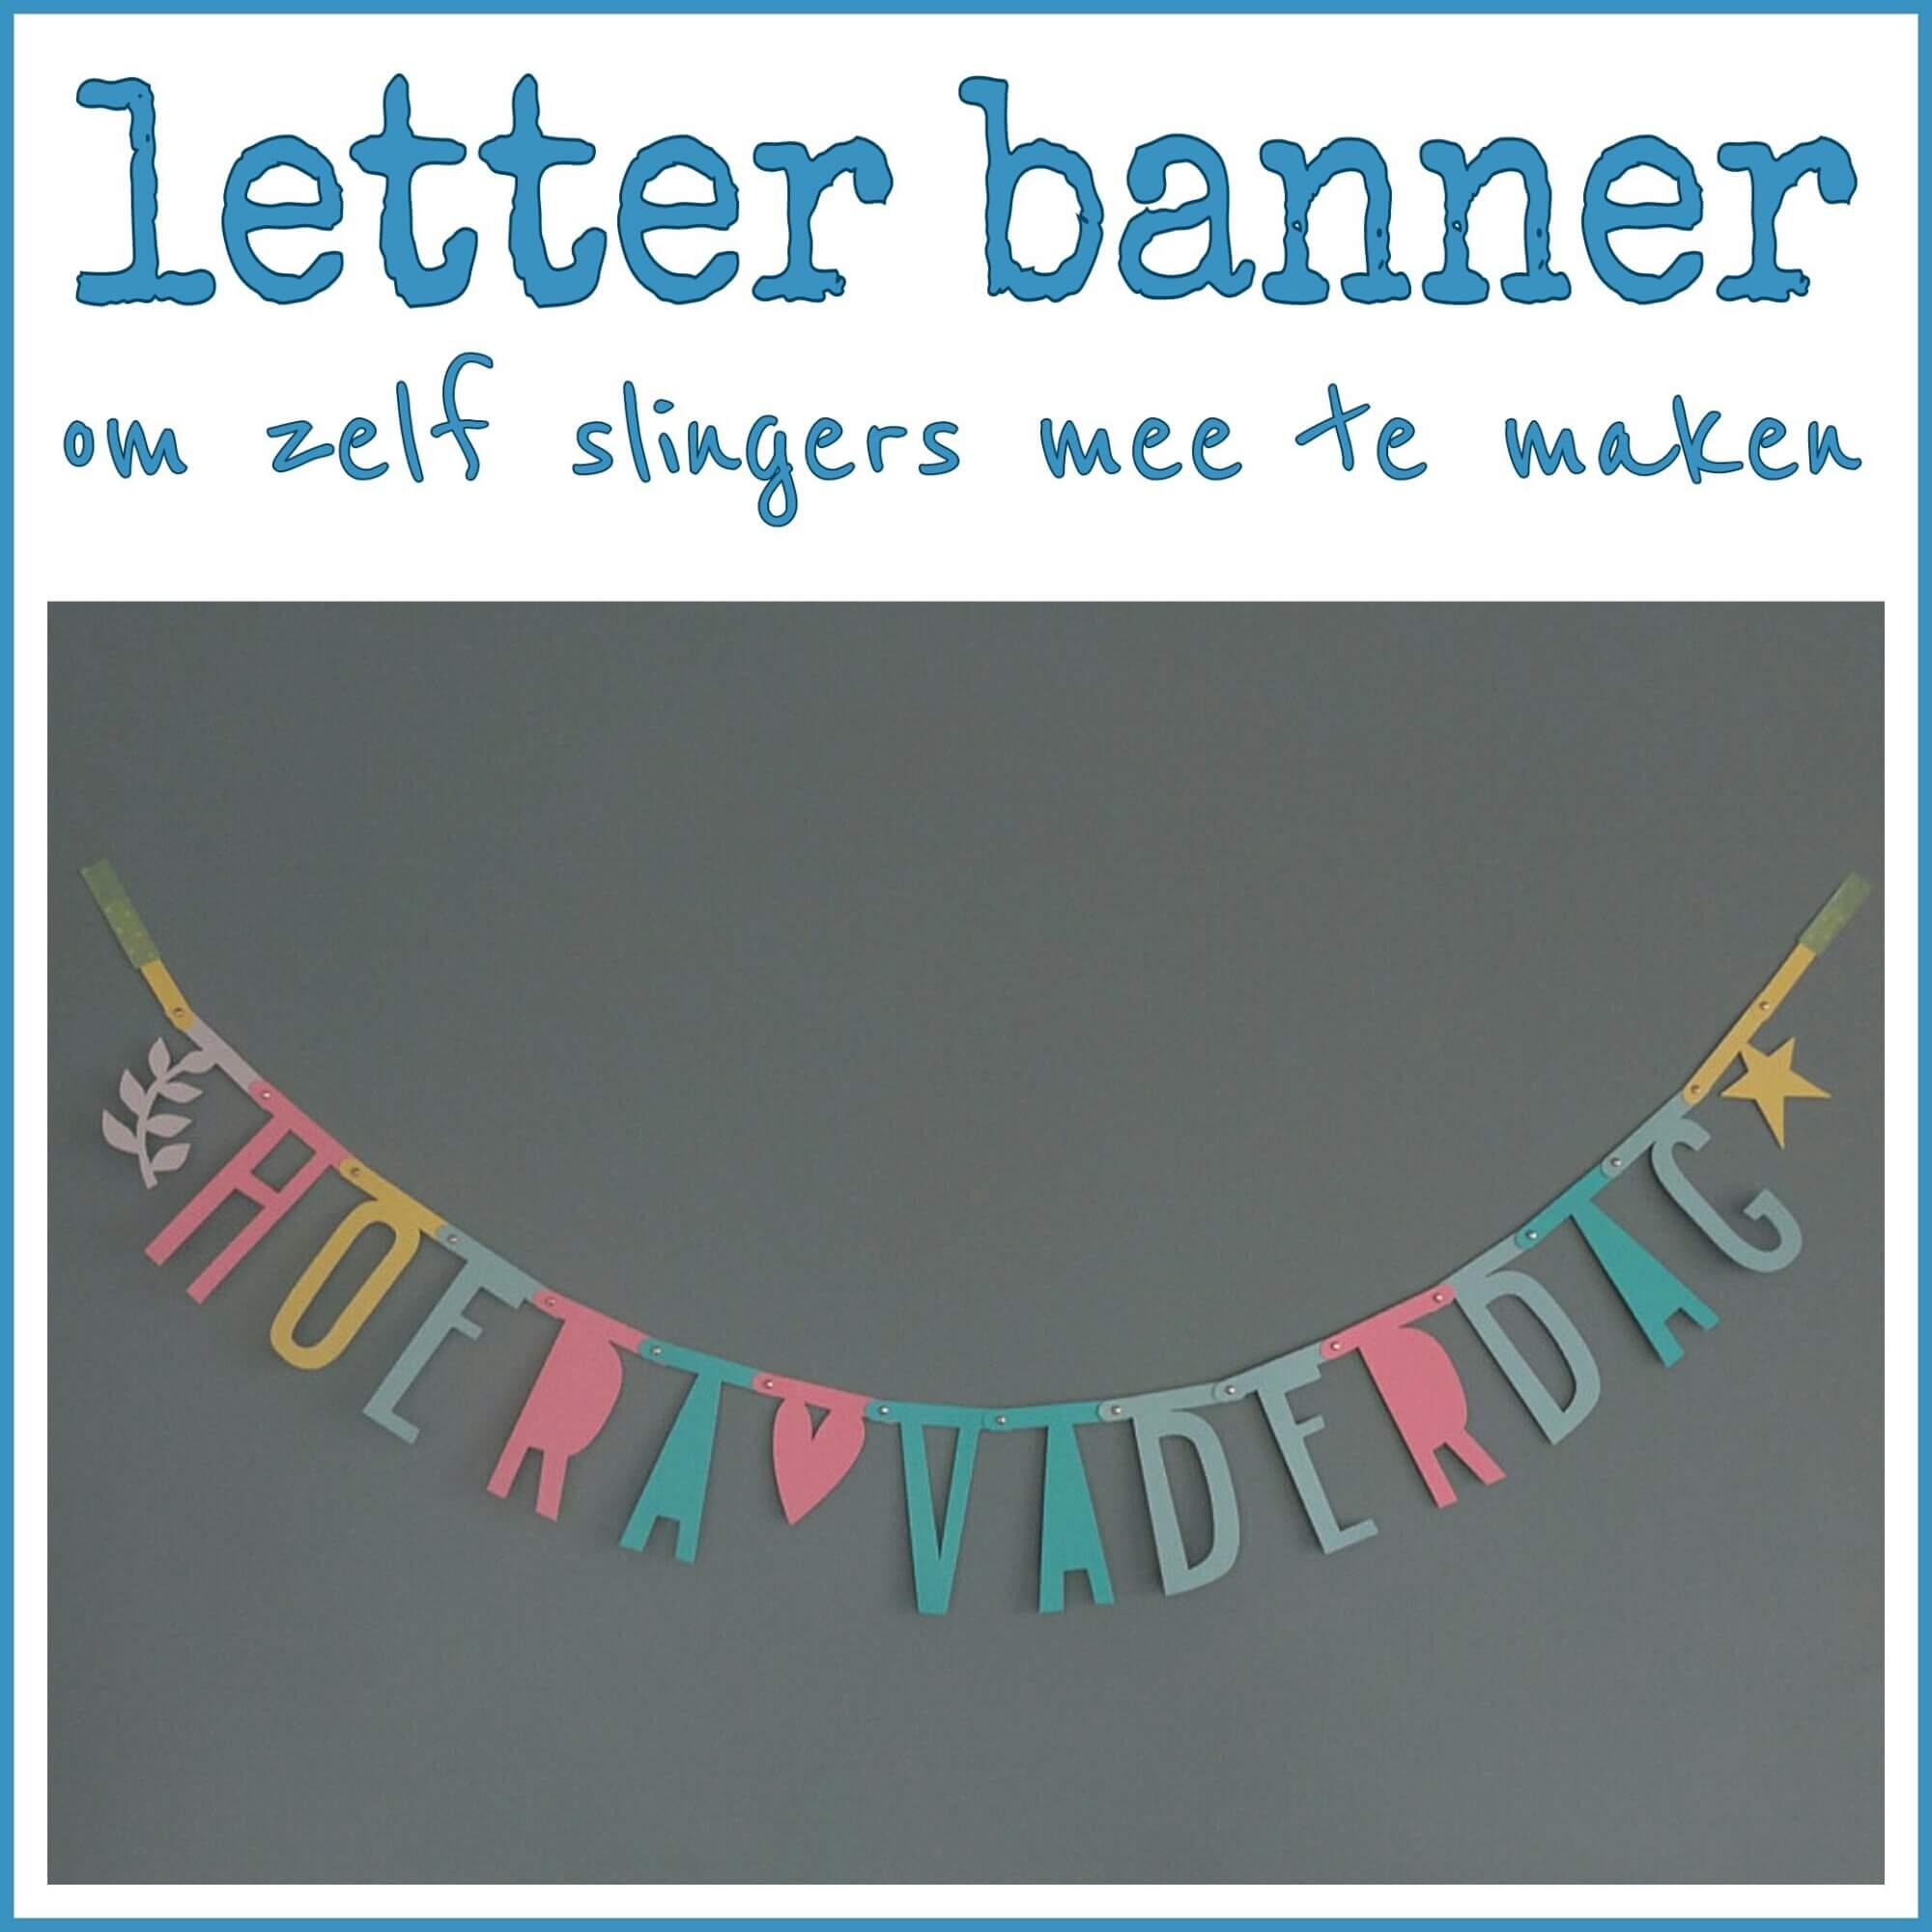 Fabulous Letter banner om zelf slingers mee te maken - Leuk met kids &LG88